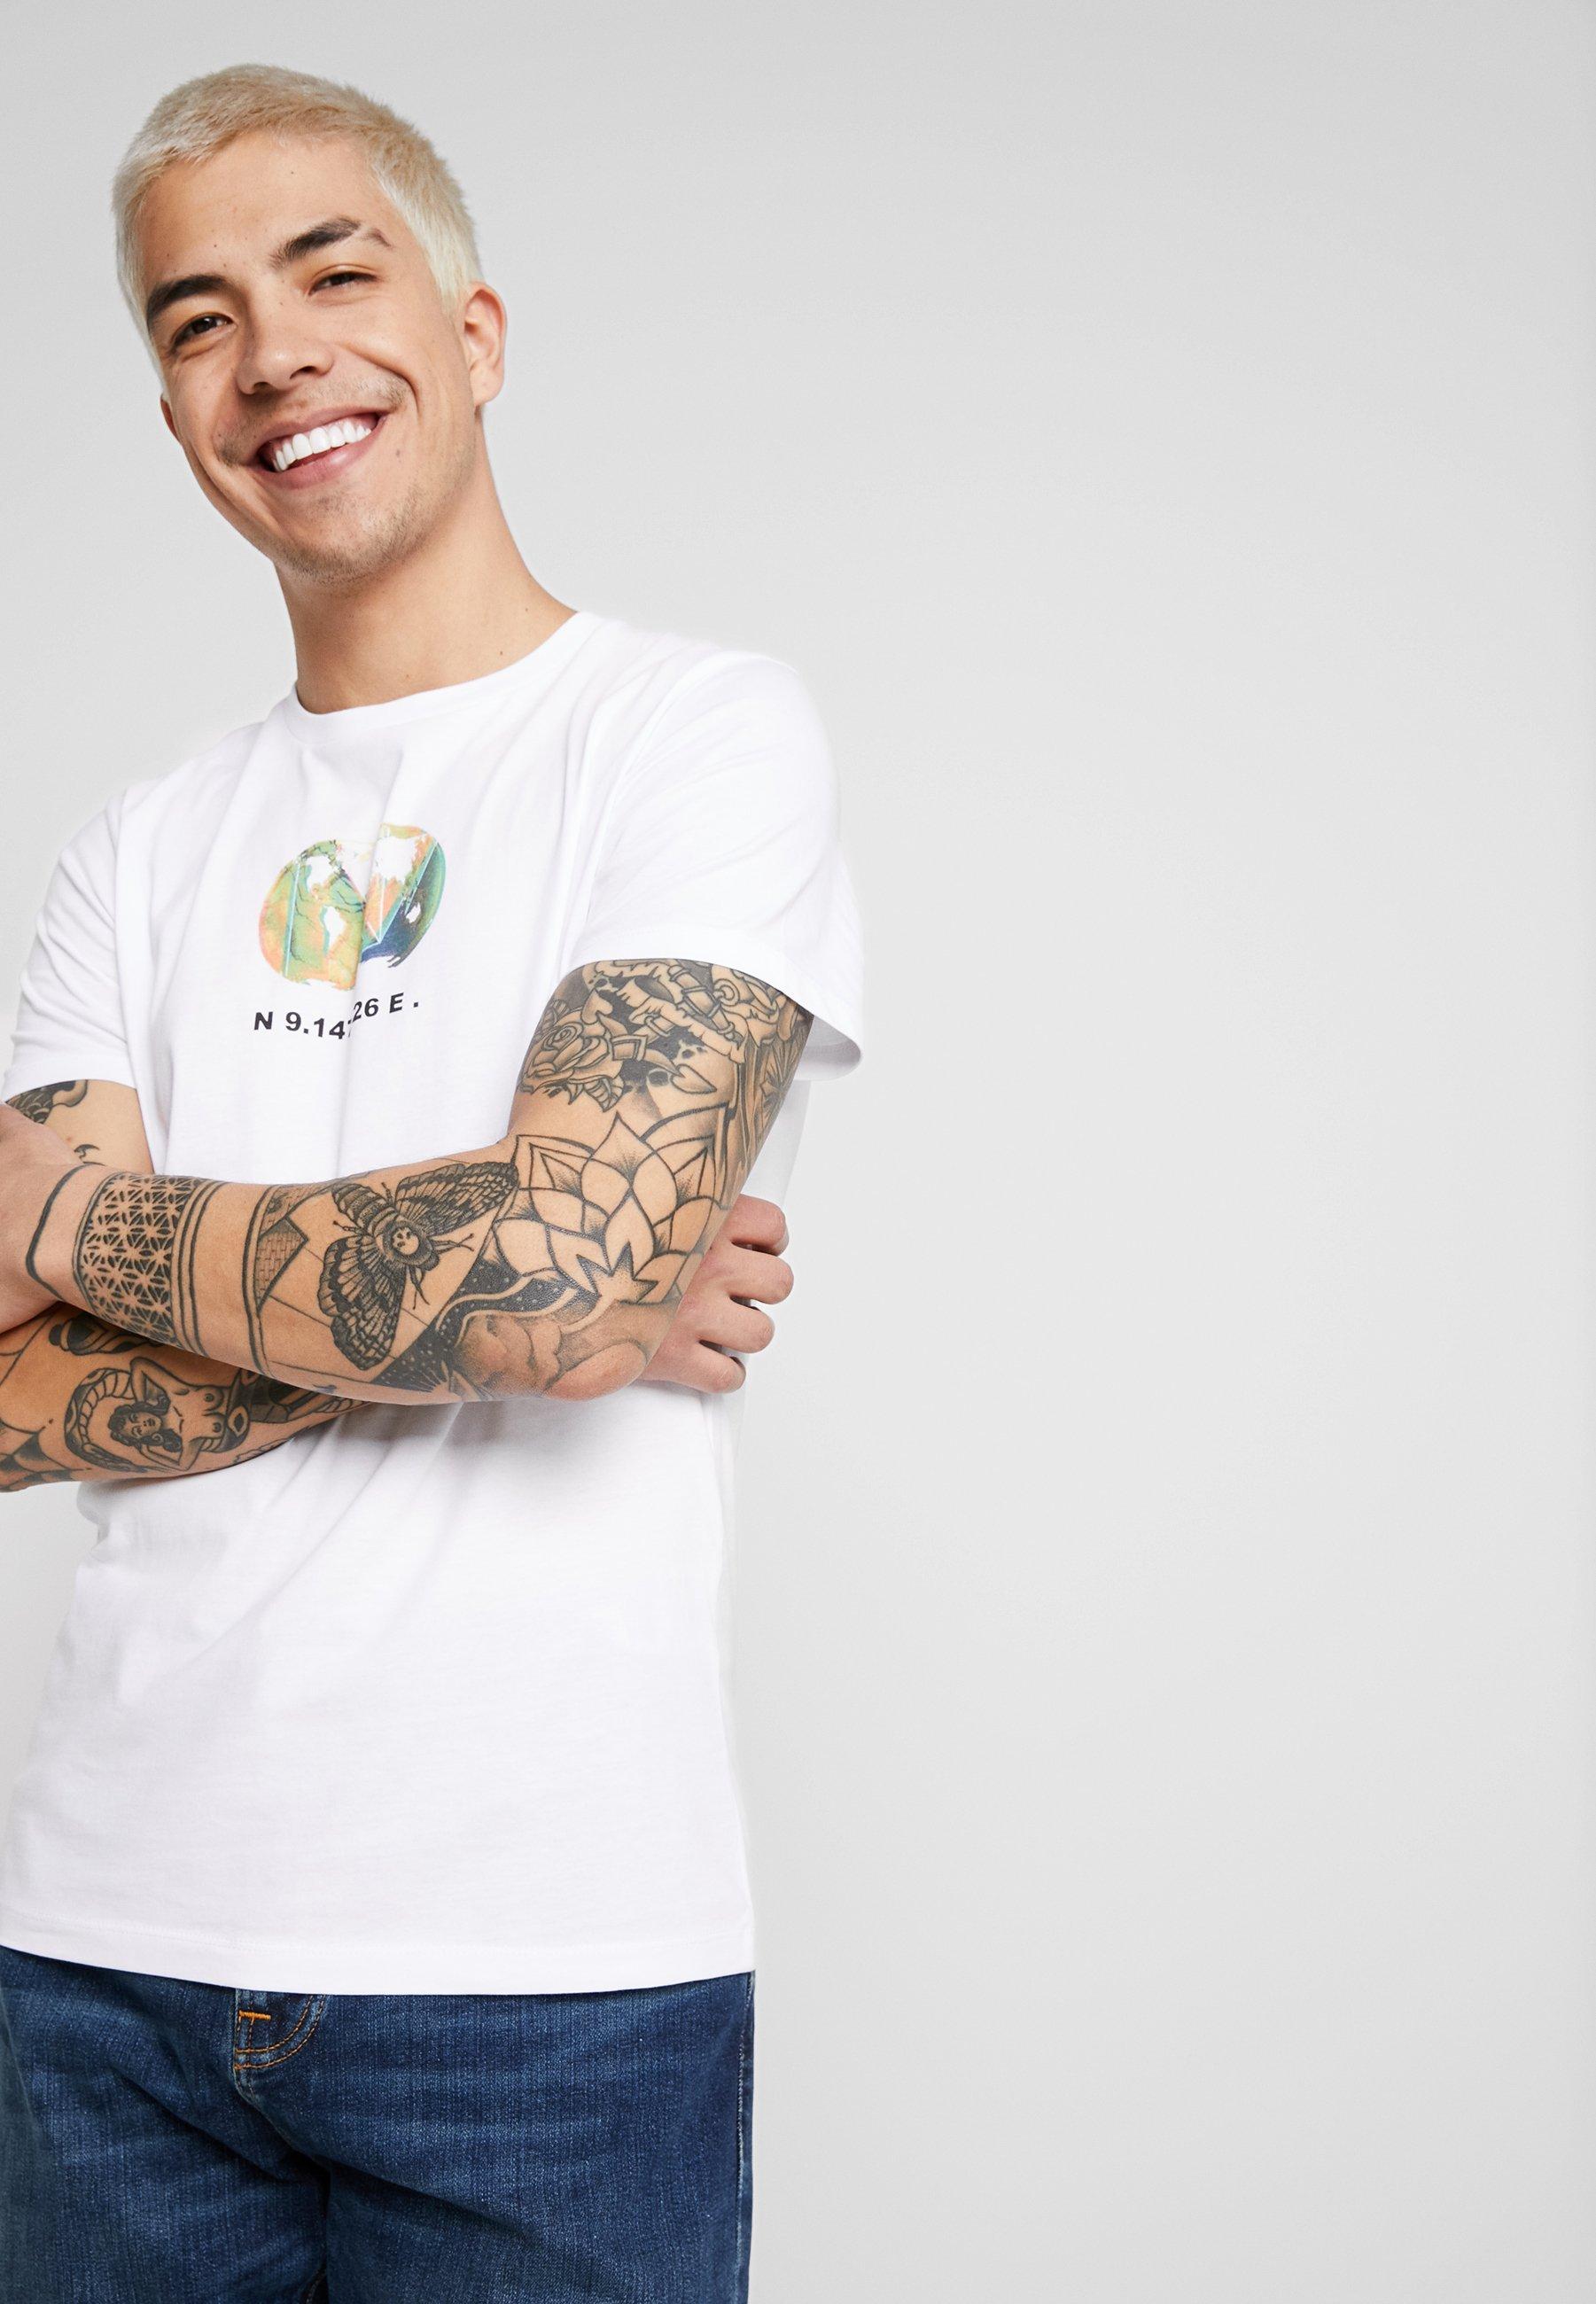 Jcographic NeckT Imprimé Jackamp; Jones shirt White Crew Tee b76yYvfg